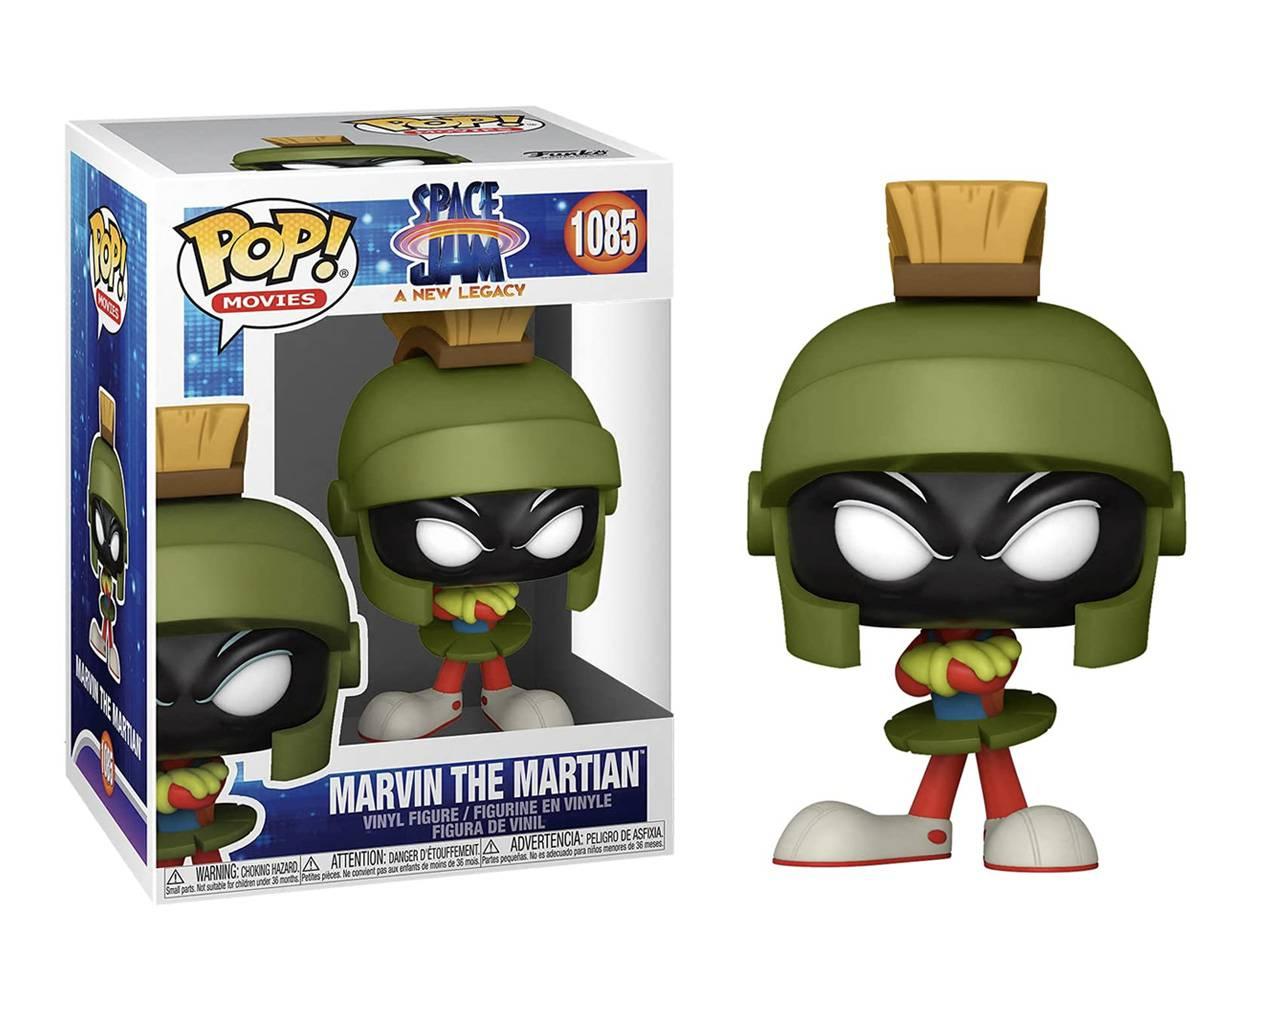 Marvin the Martian (Space Jam 2) Pop! Vinyl